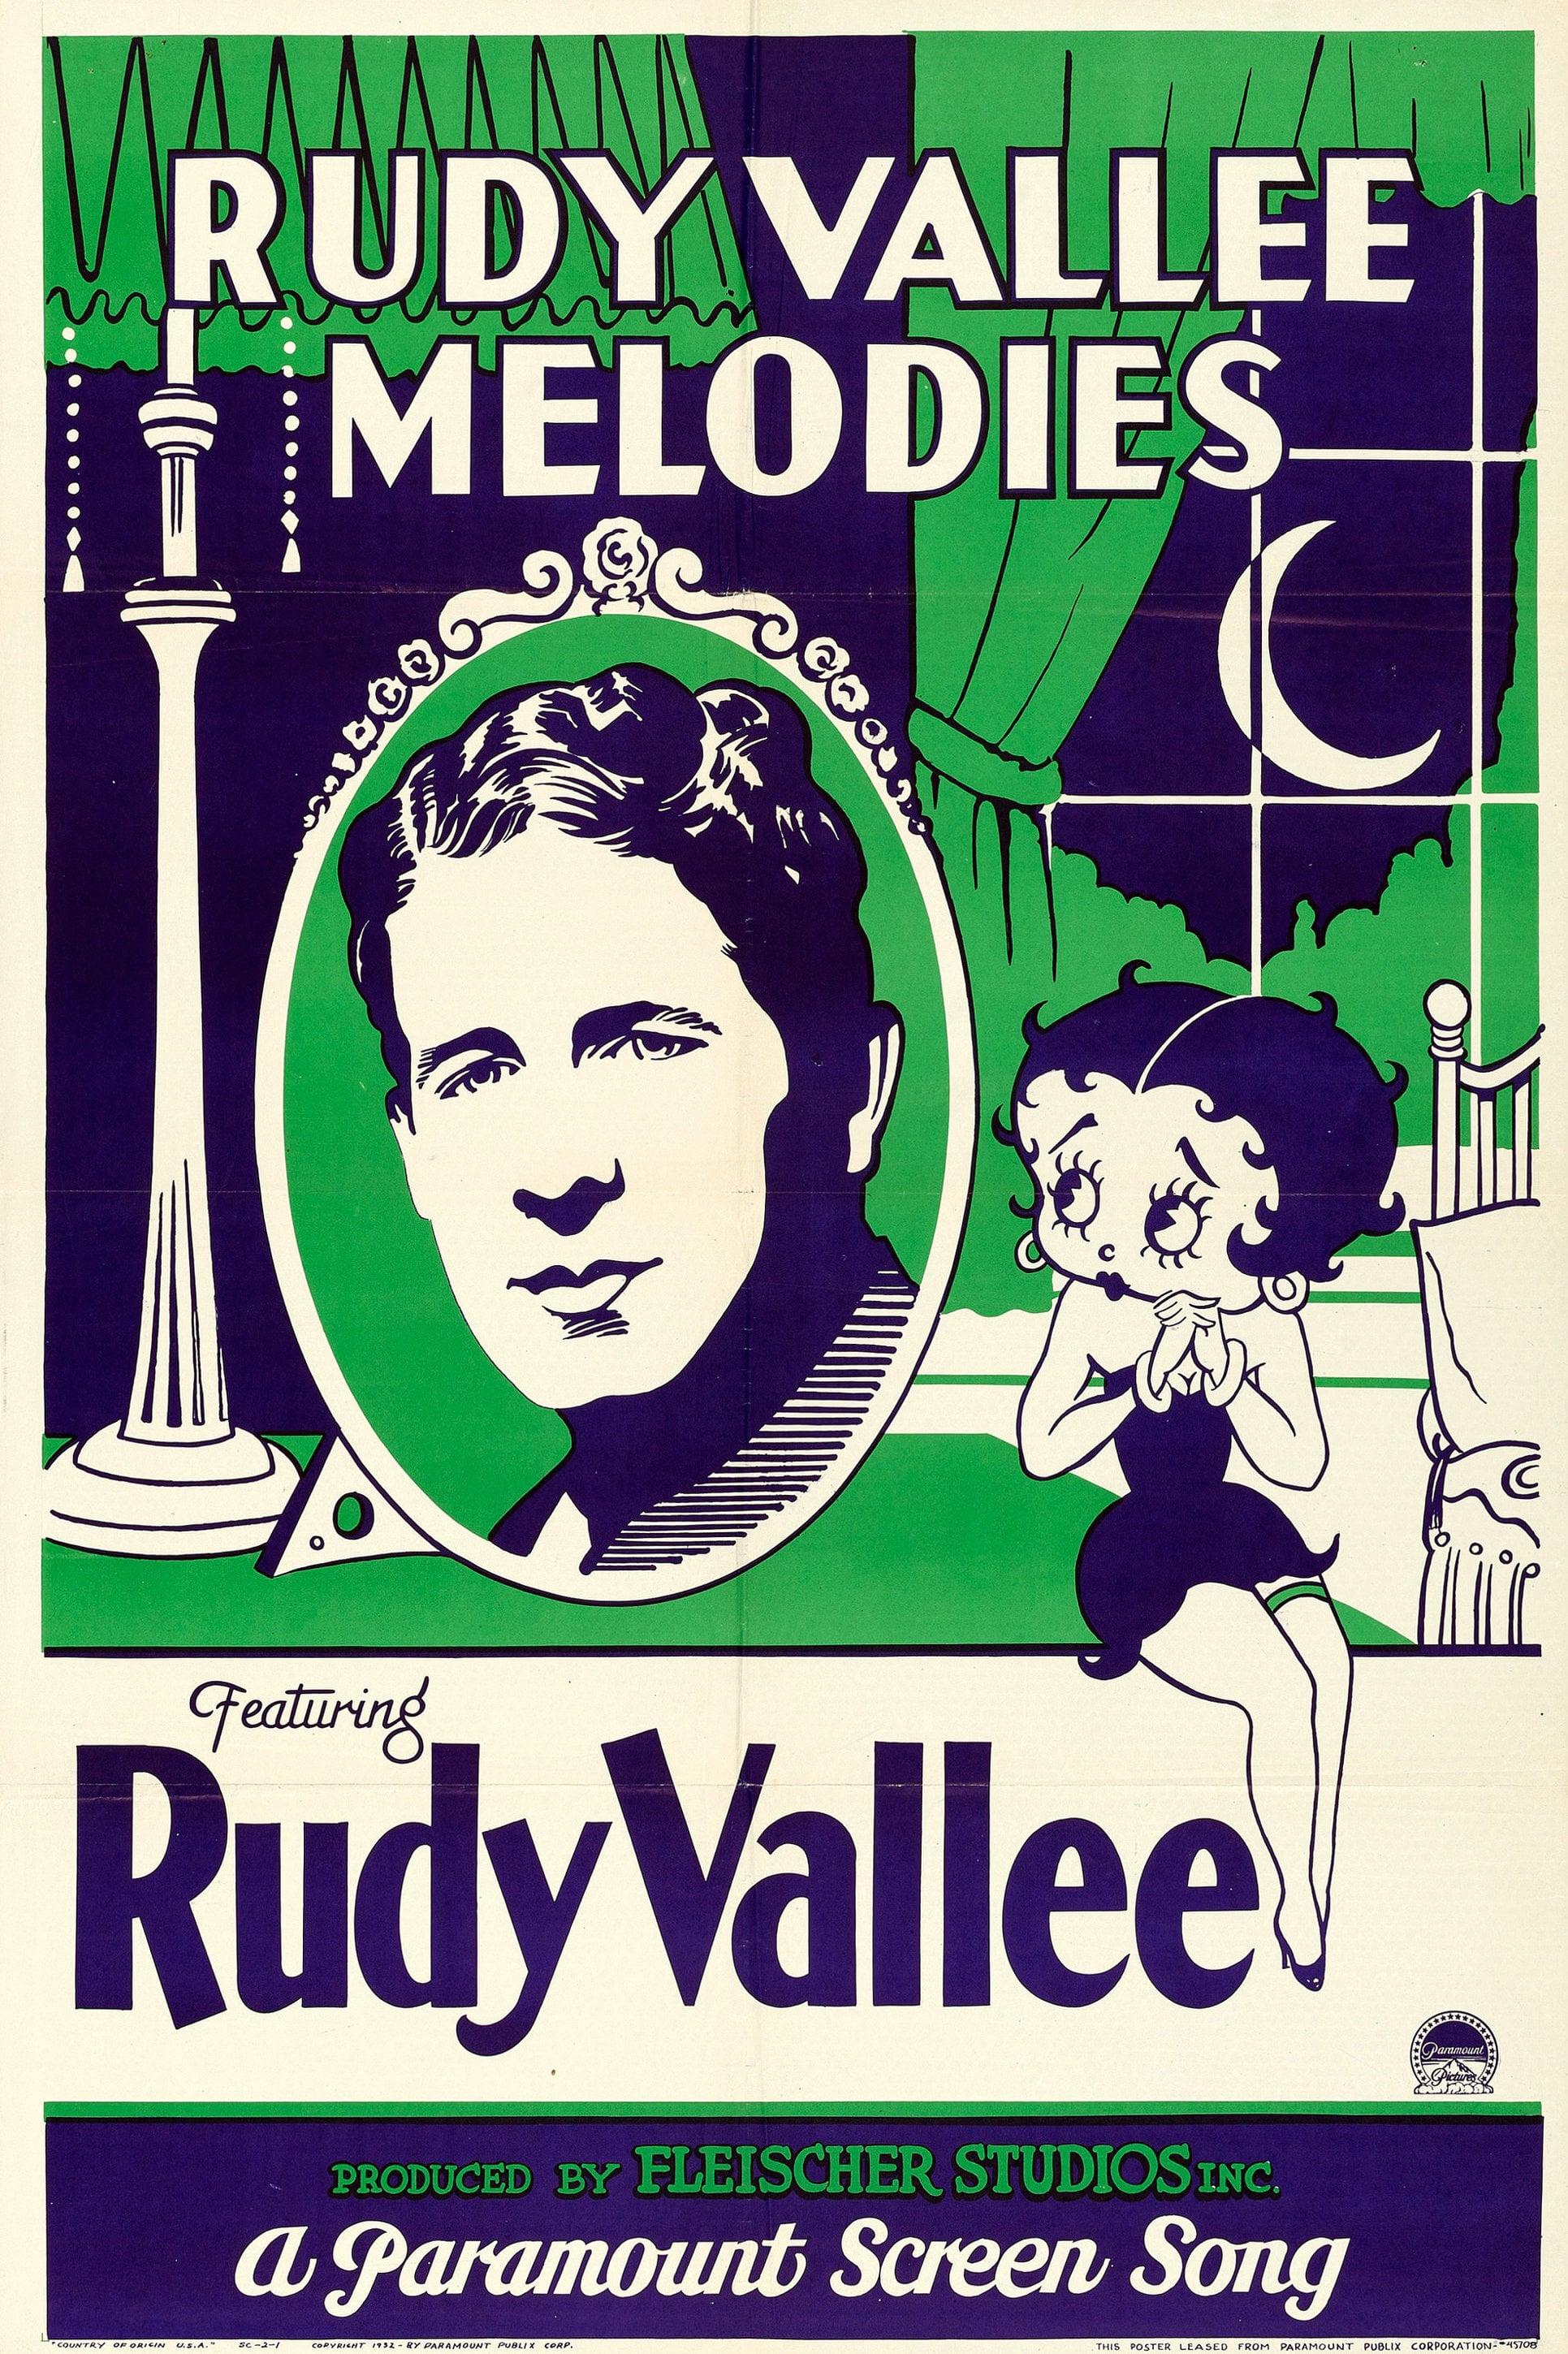 Rudy Vallee Melodies